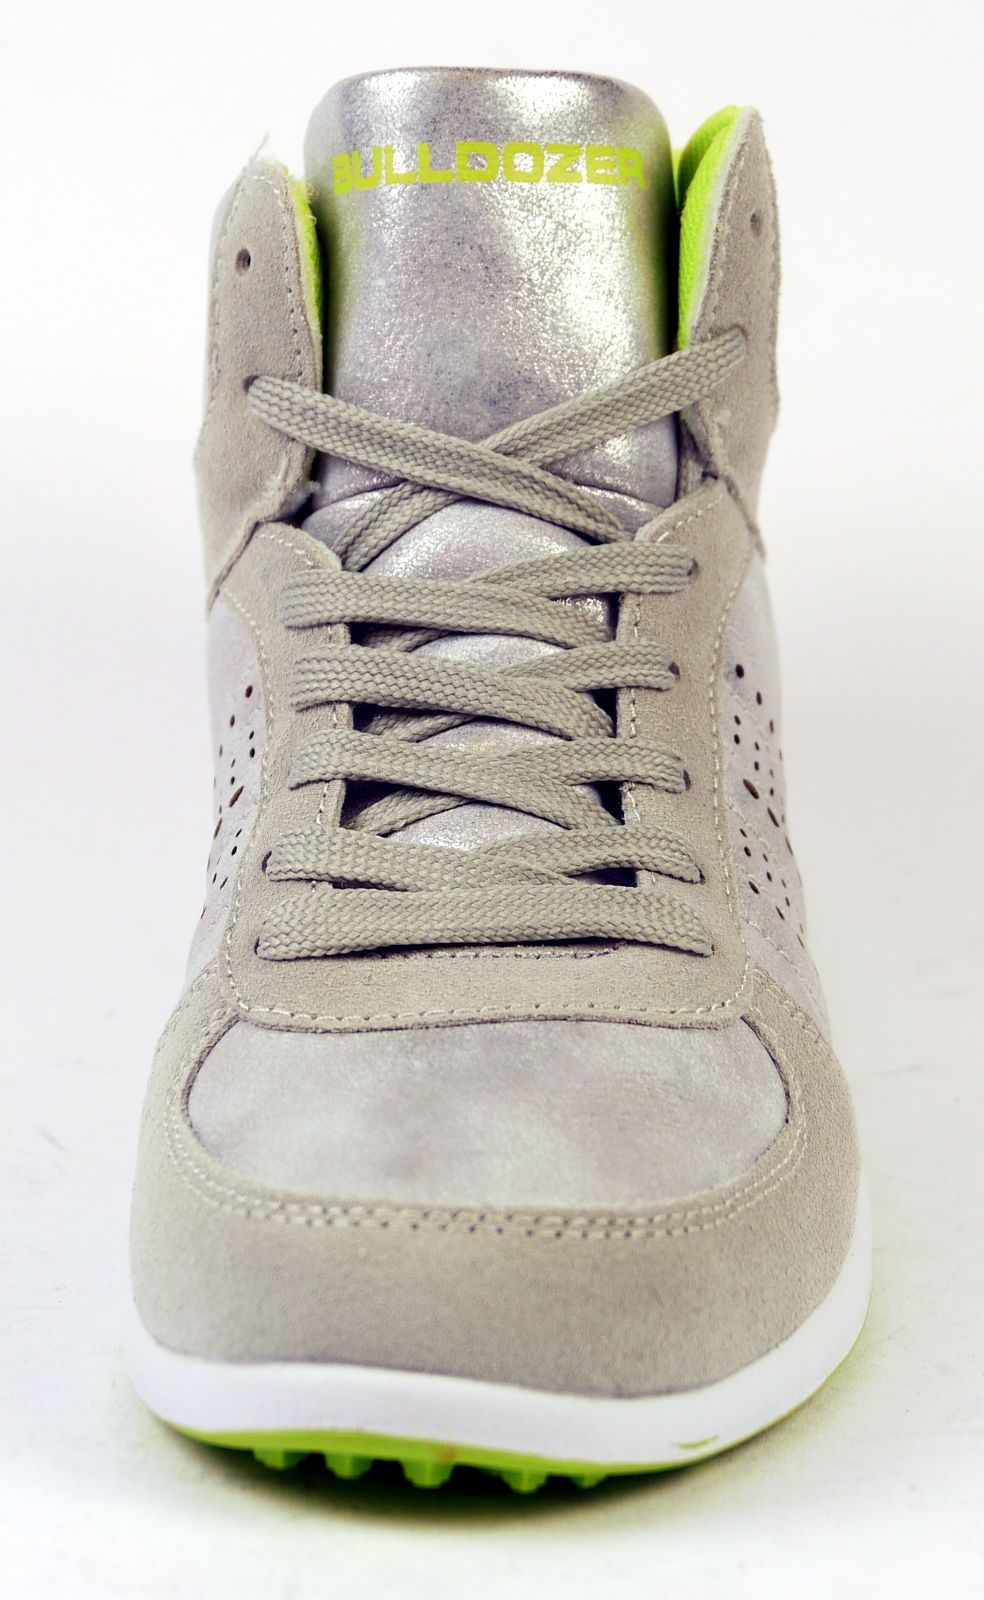 Pin von Horst Roosen auf Sportluxustreter | Sneakers, Shoes